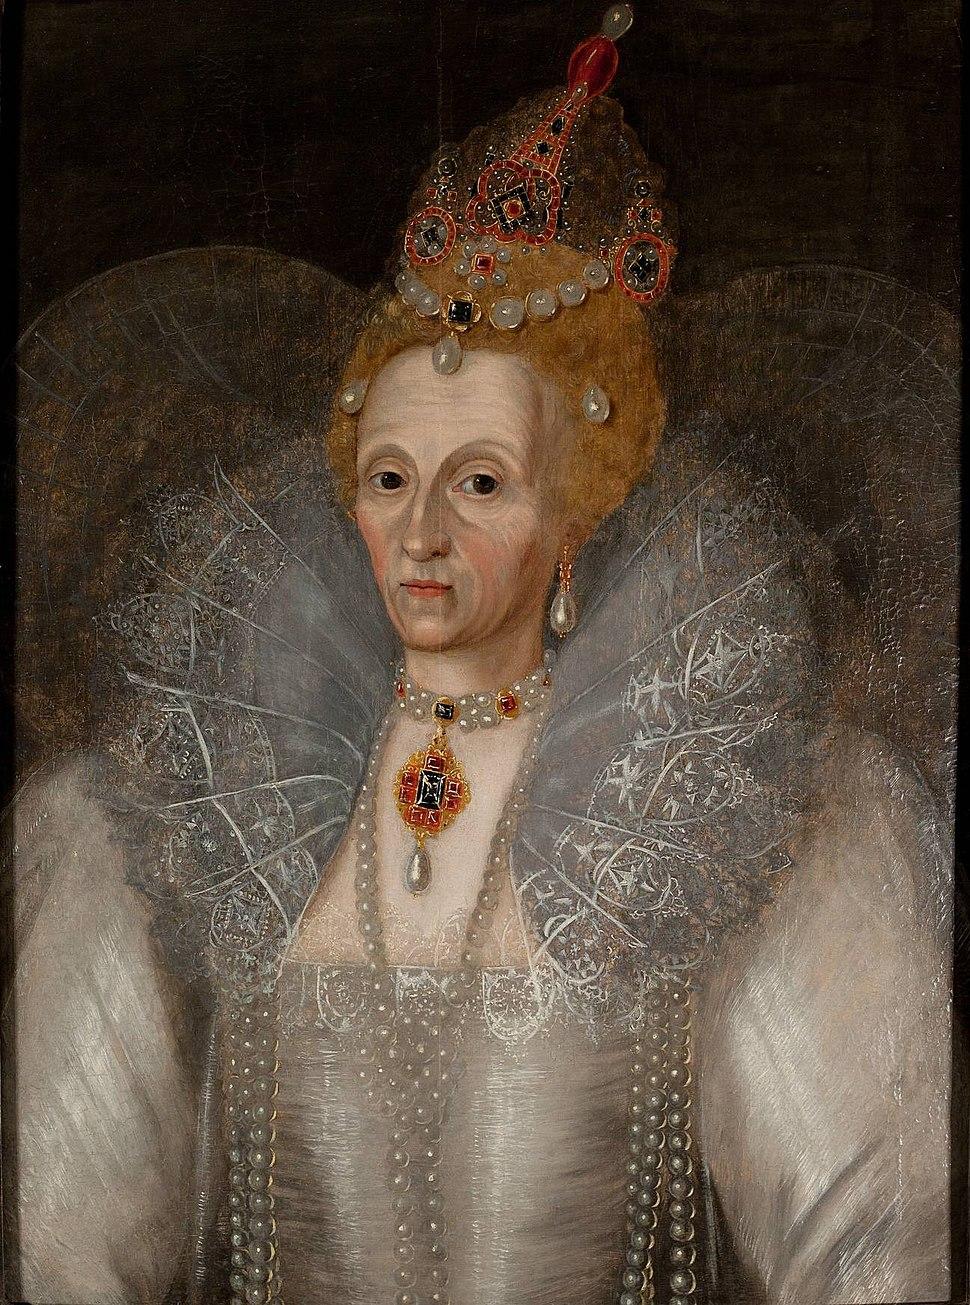 Elizabeth I portrait, Marcus Gheeraerts the Younger c.1595